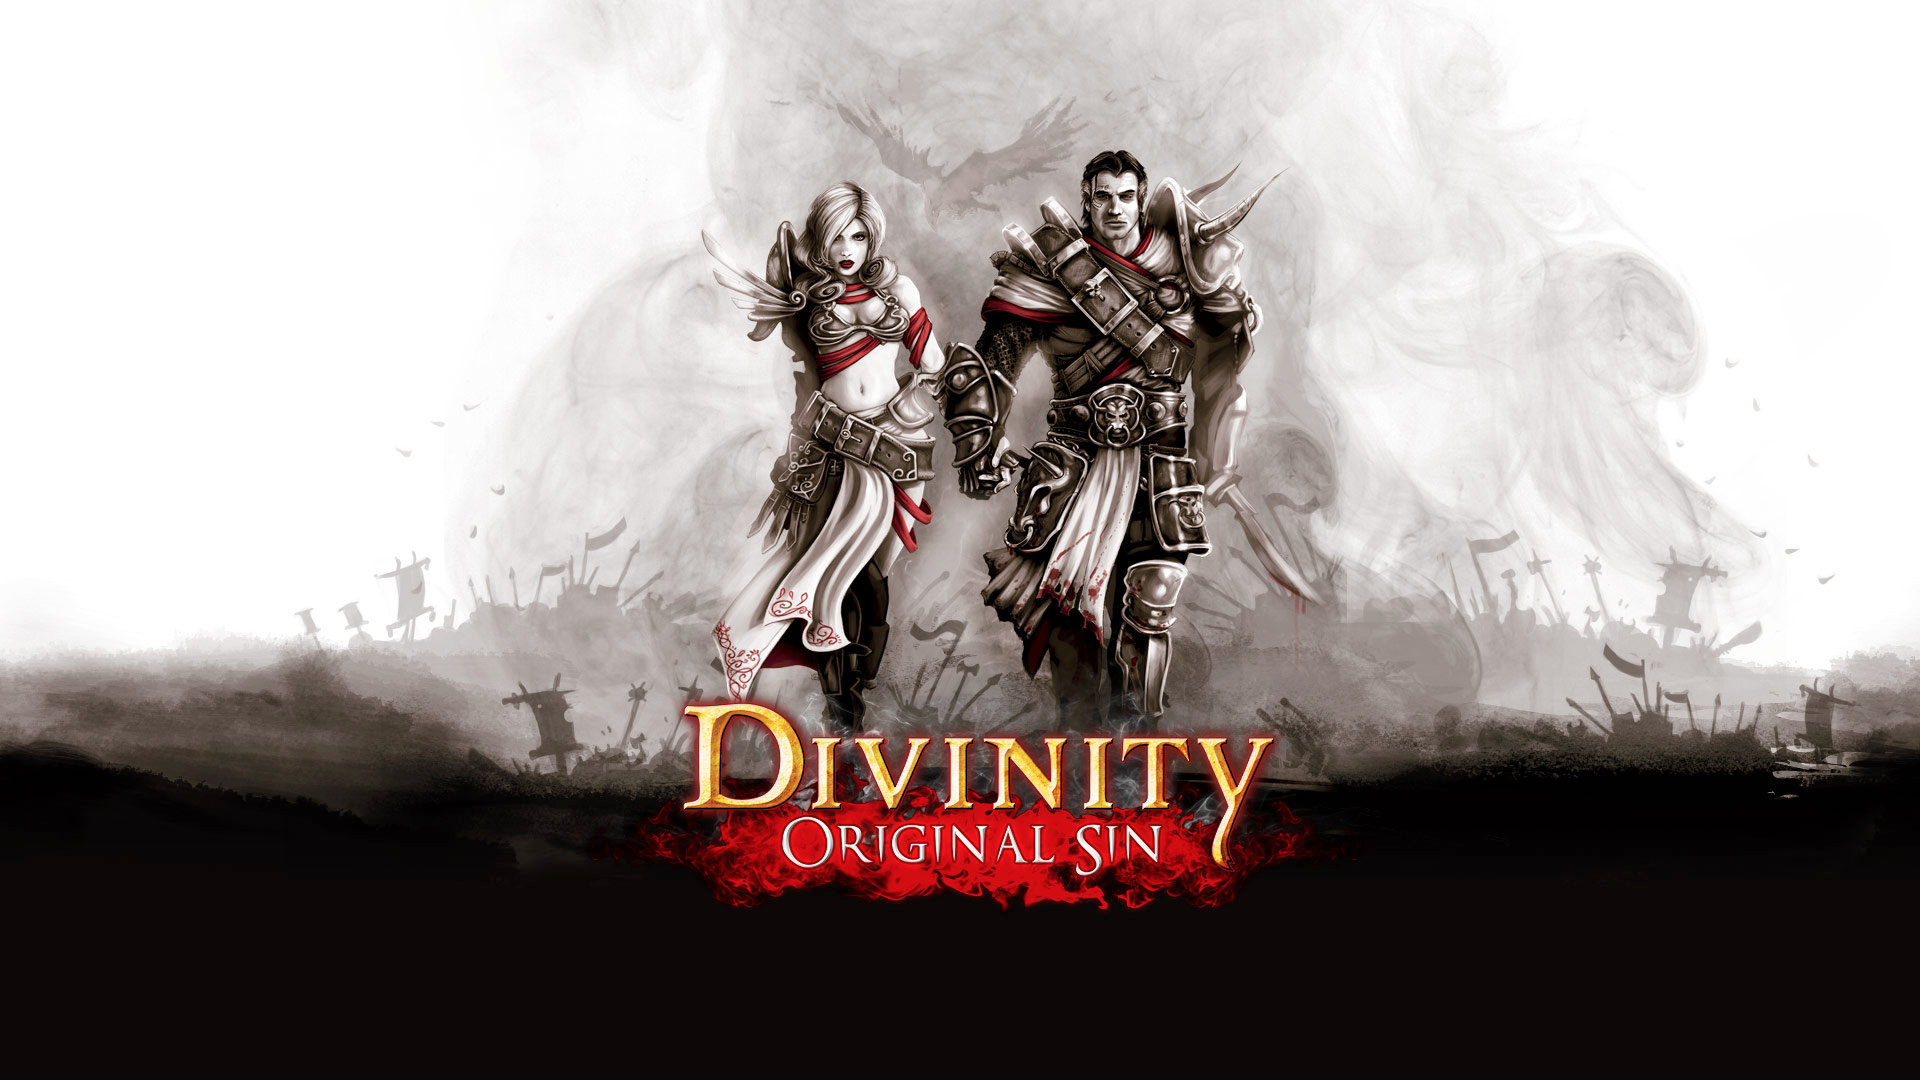 Divinity: Orignal Sin